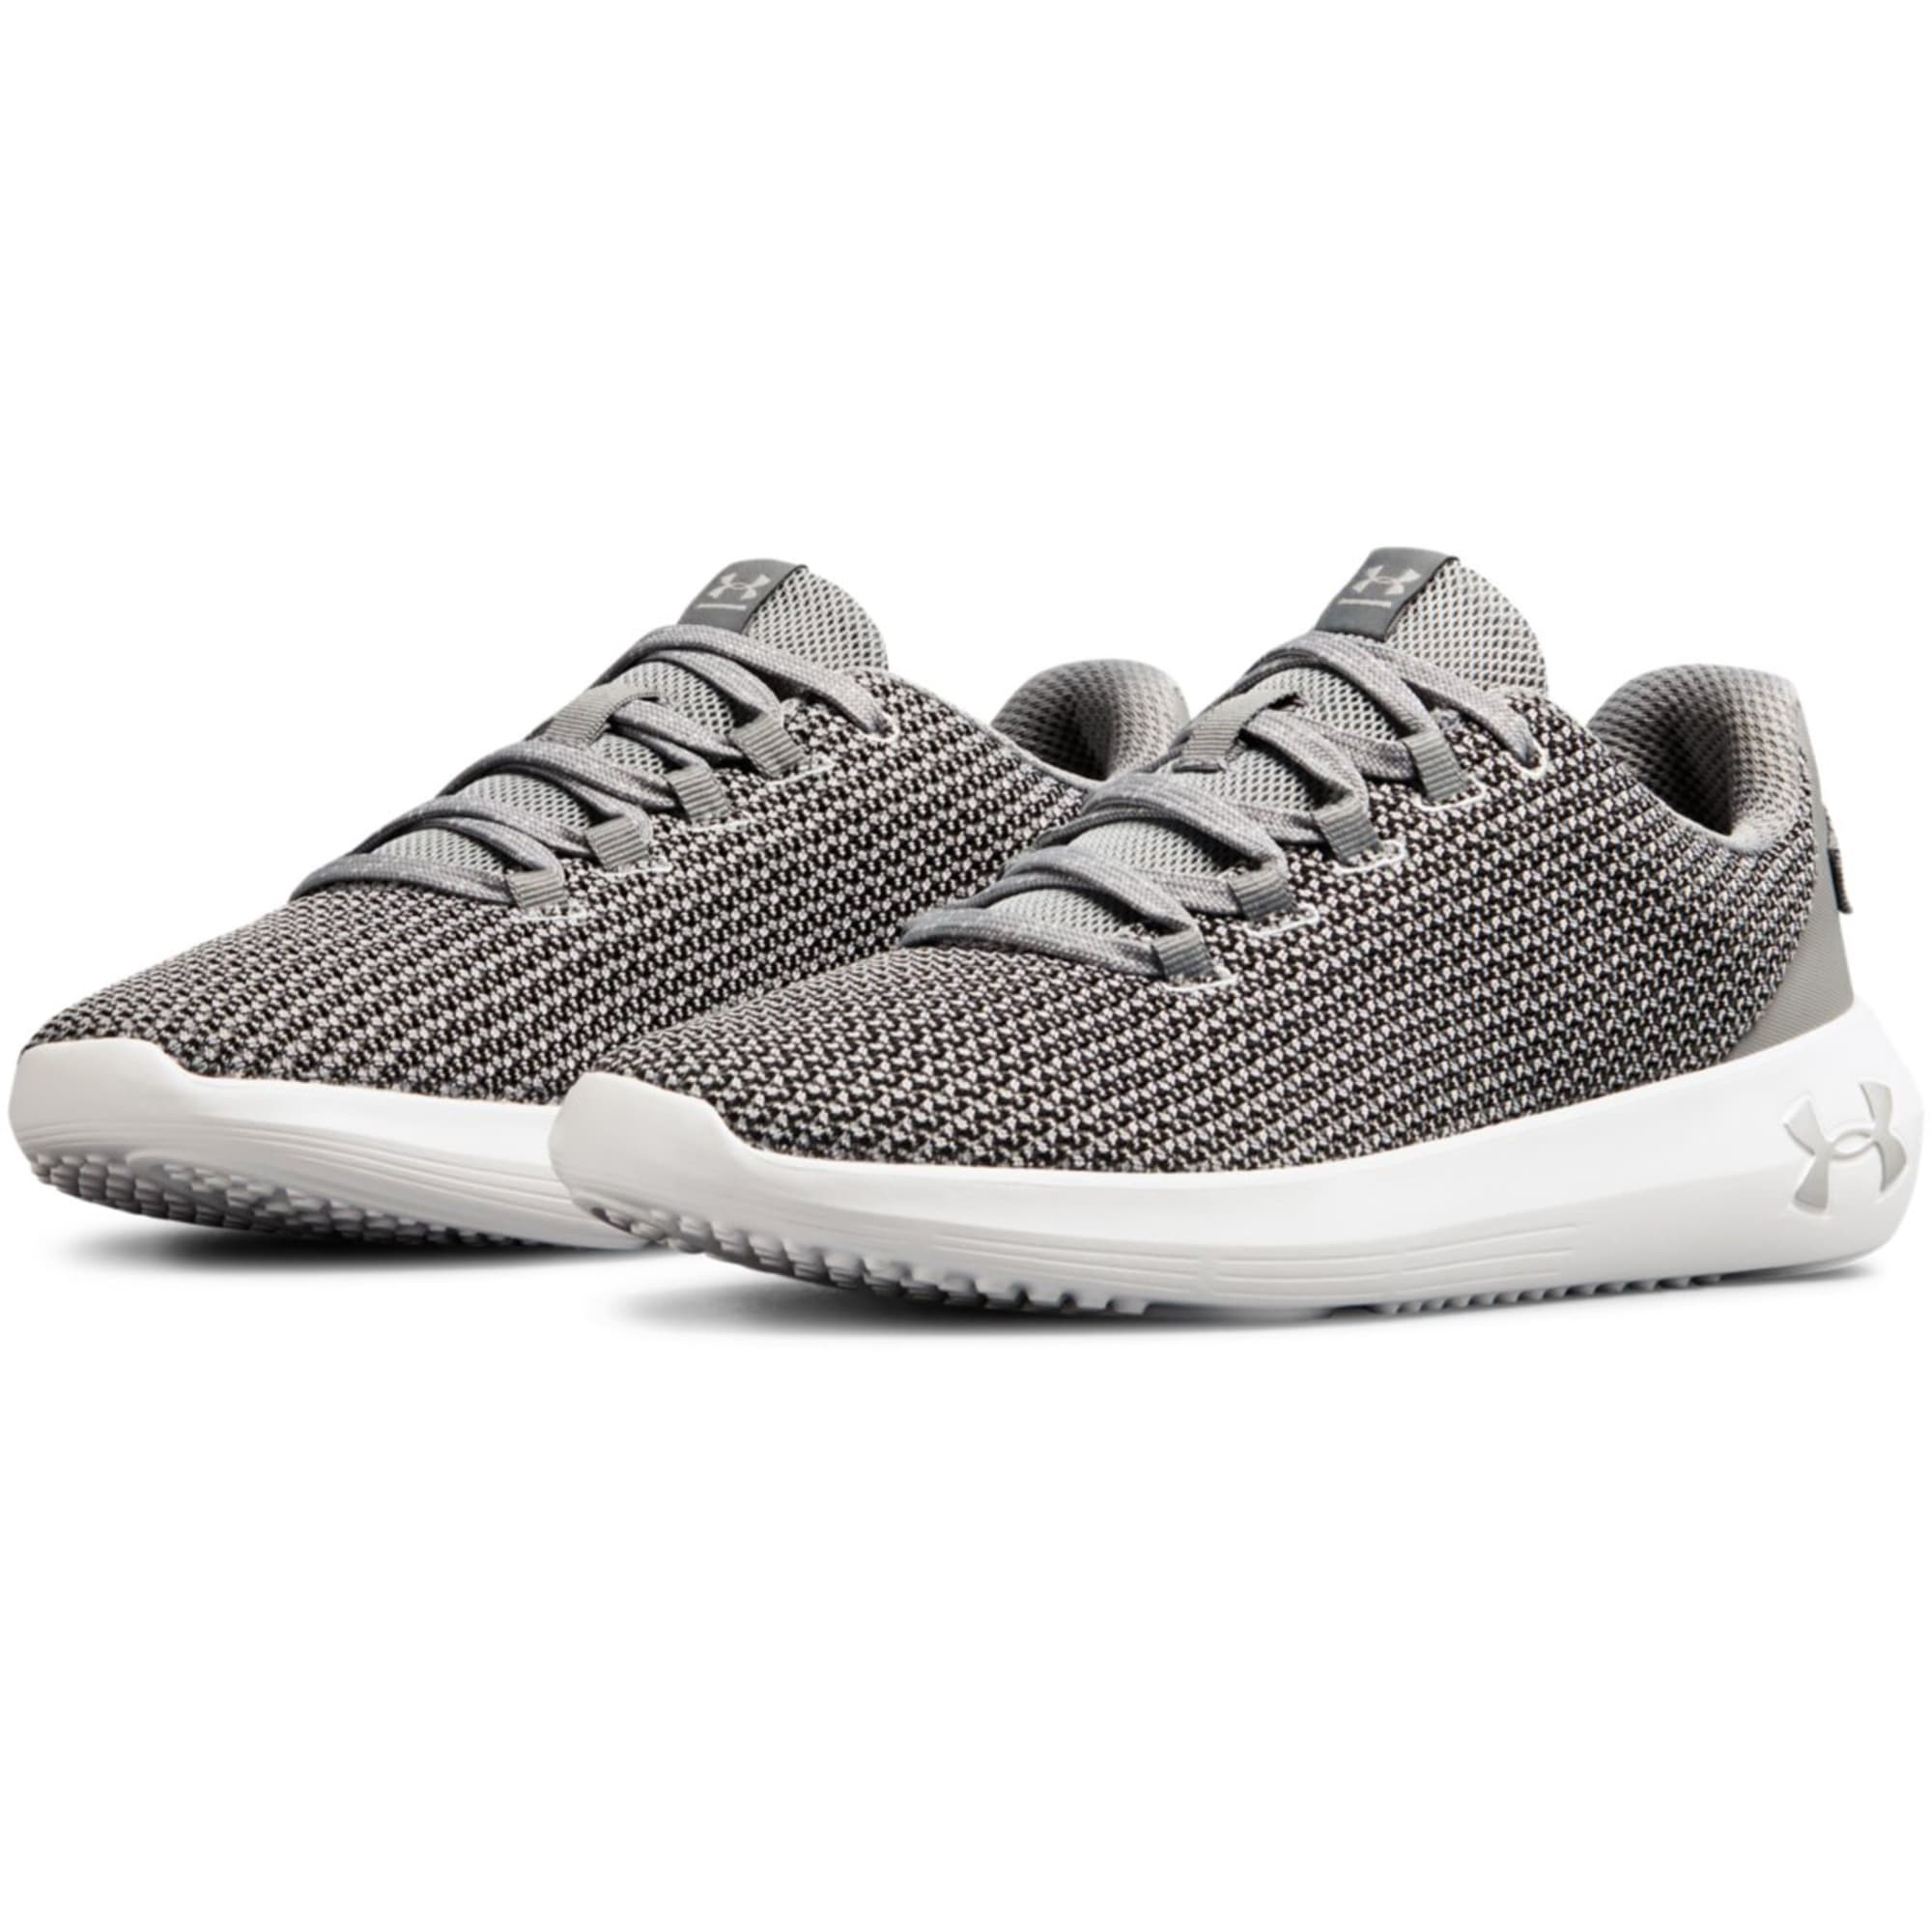 UA Ripple MTL Running Shoes